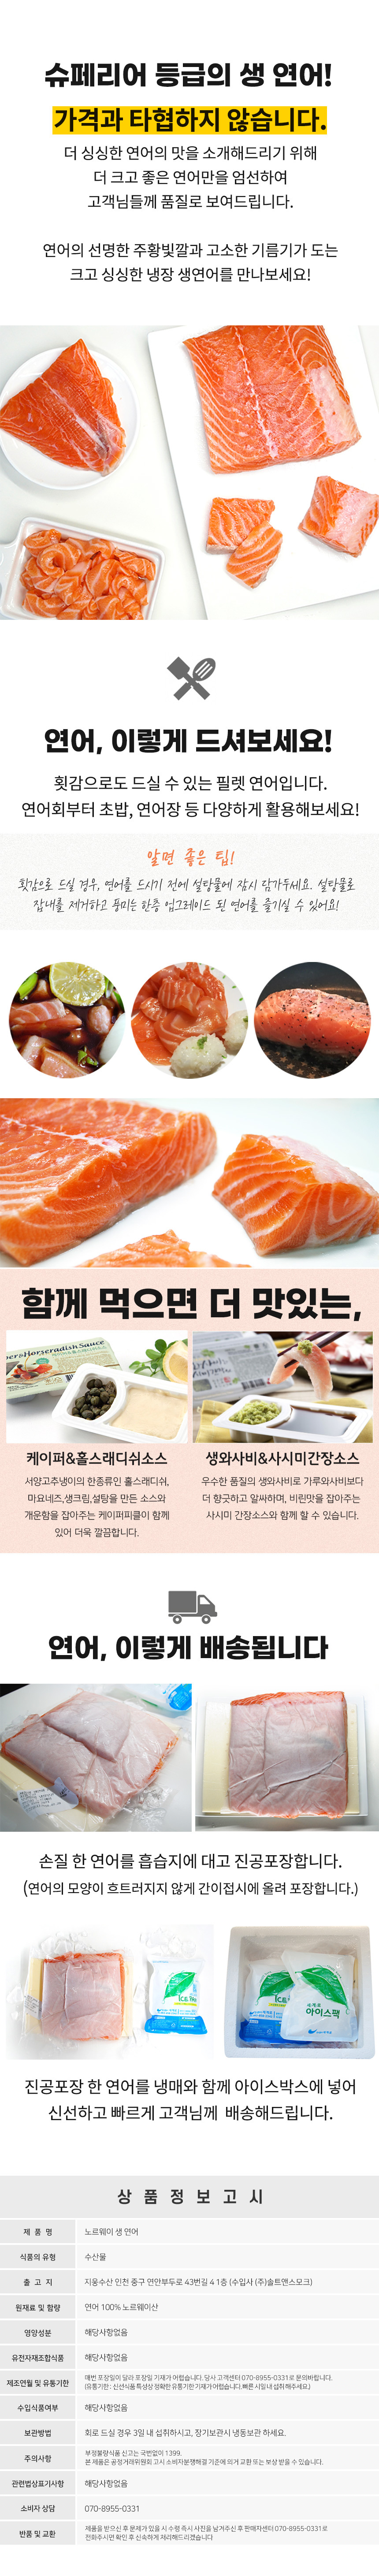 salmon_aweb_02.jpg